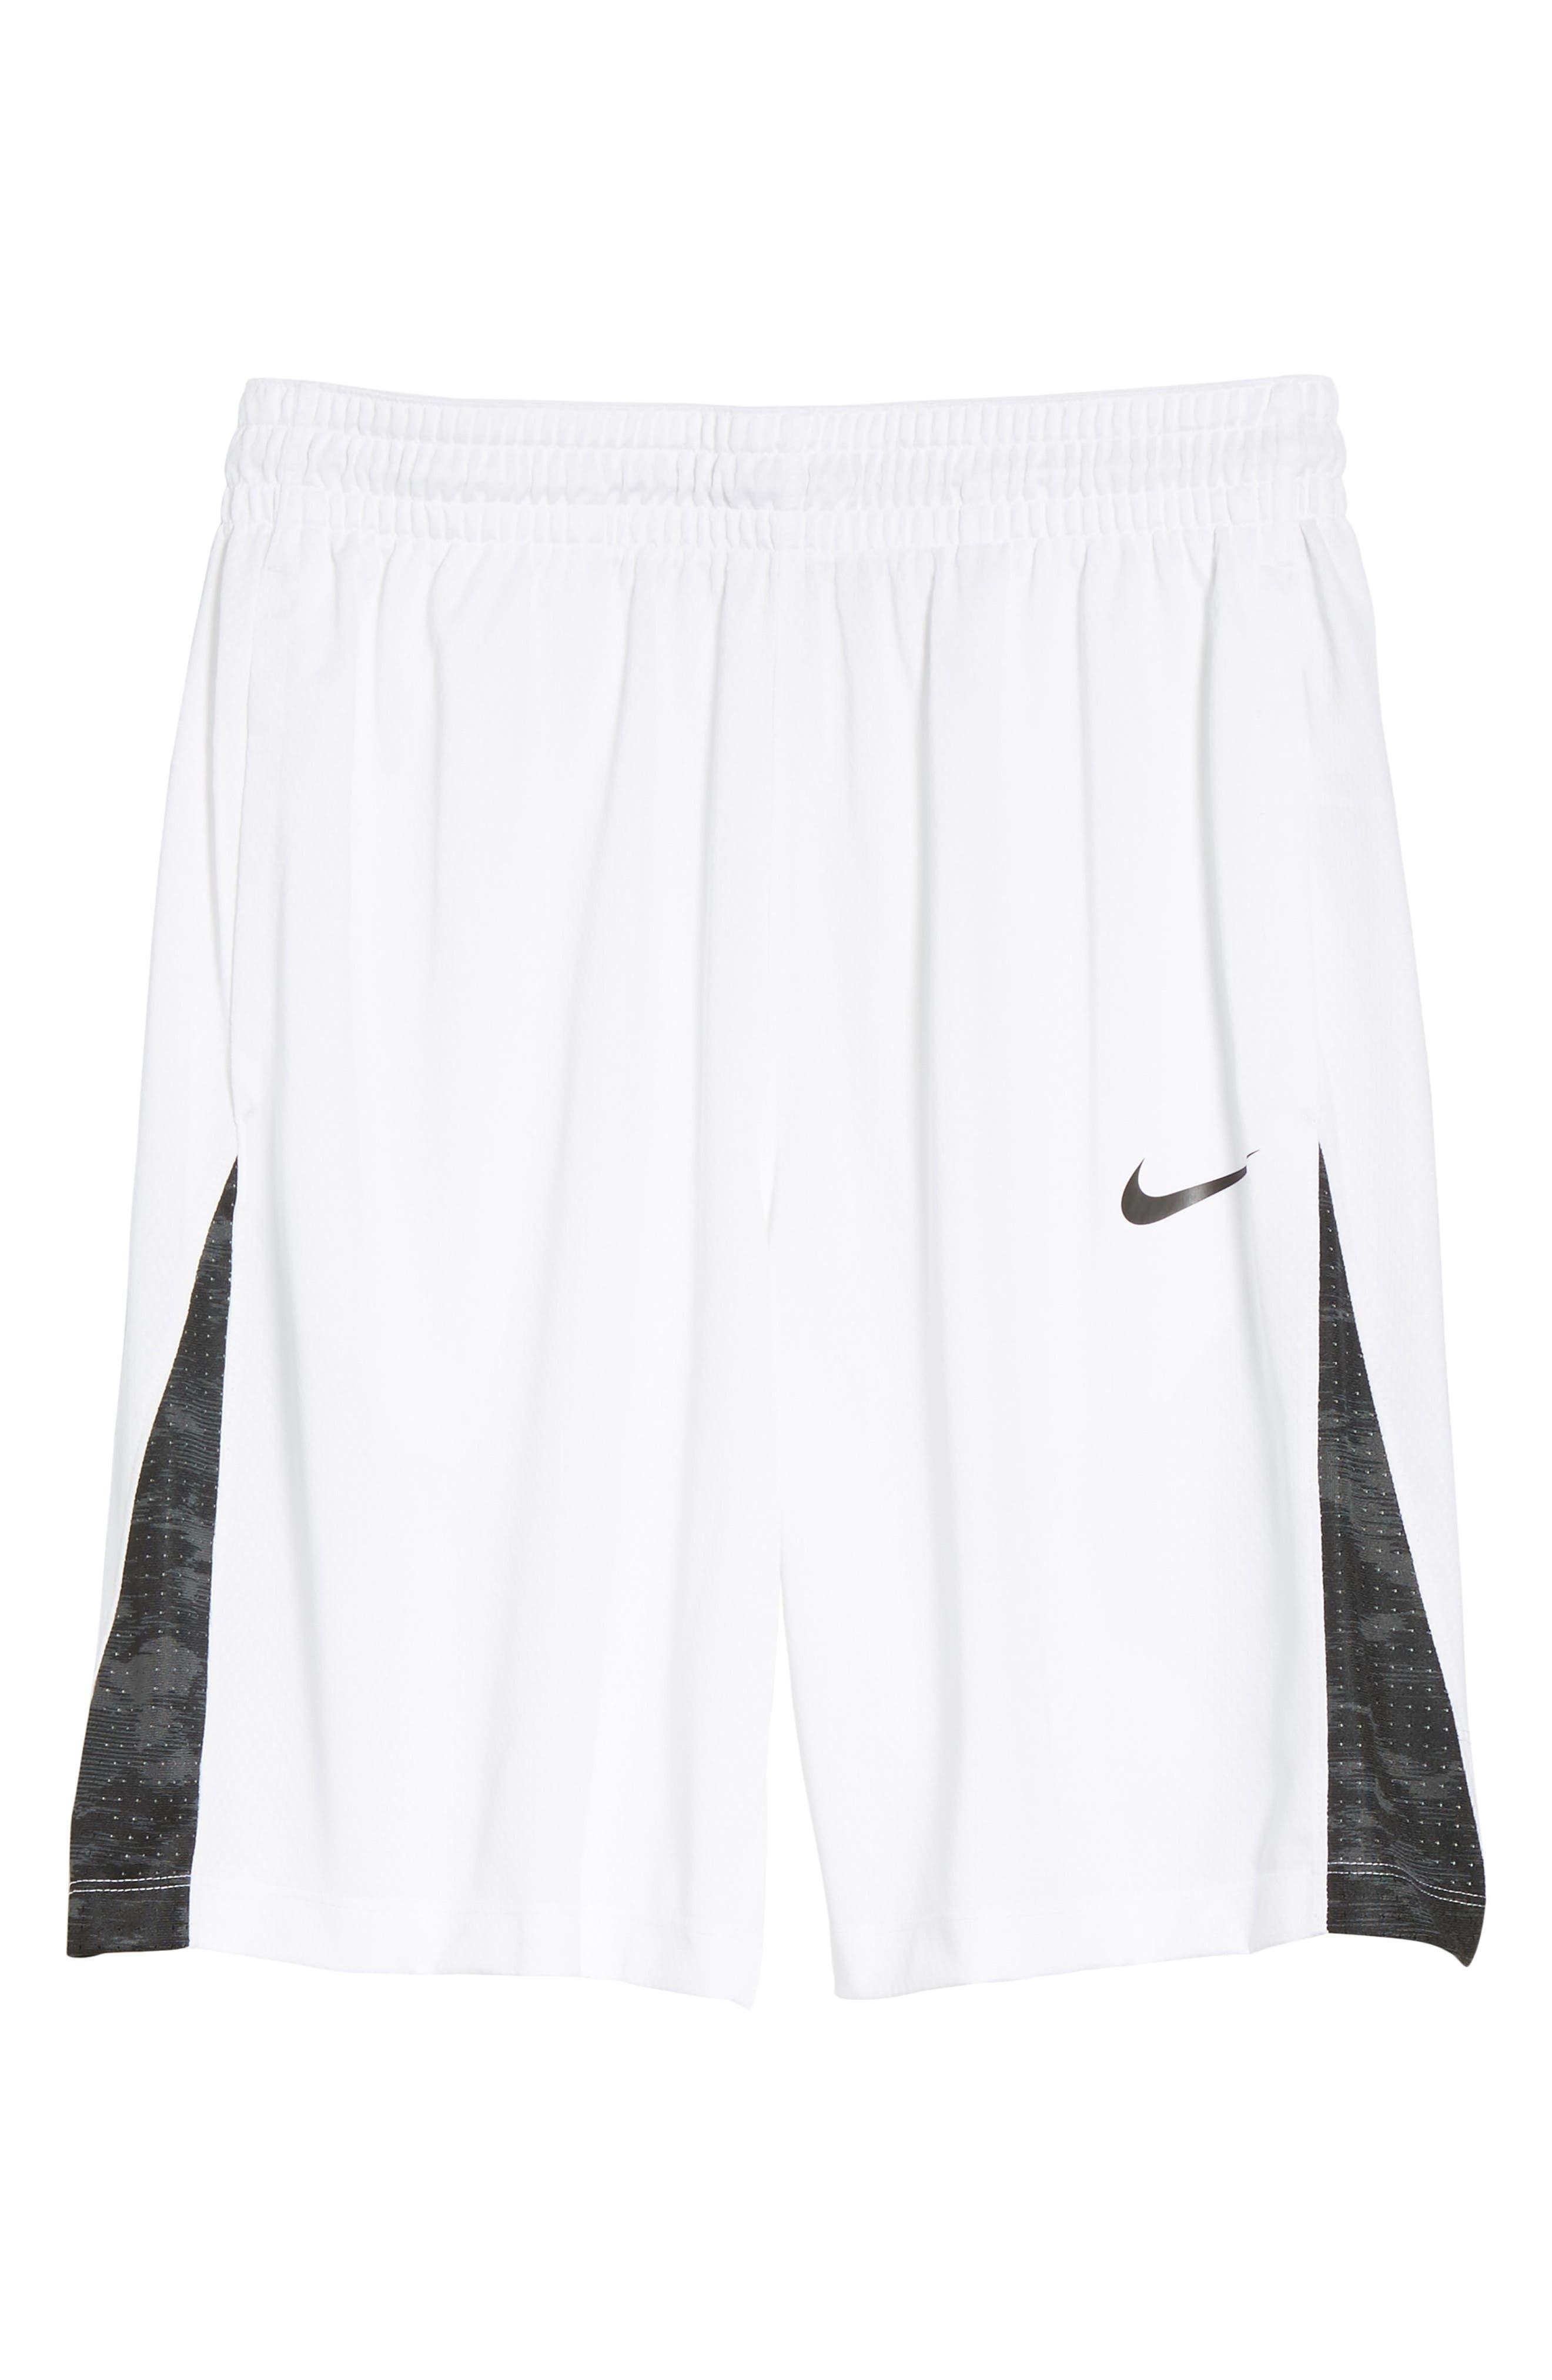 Basketball Shorts,                         Main,                         color, White/ Black